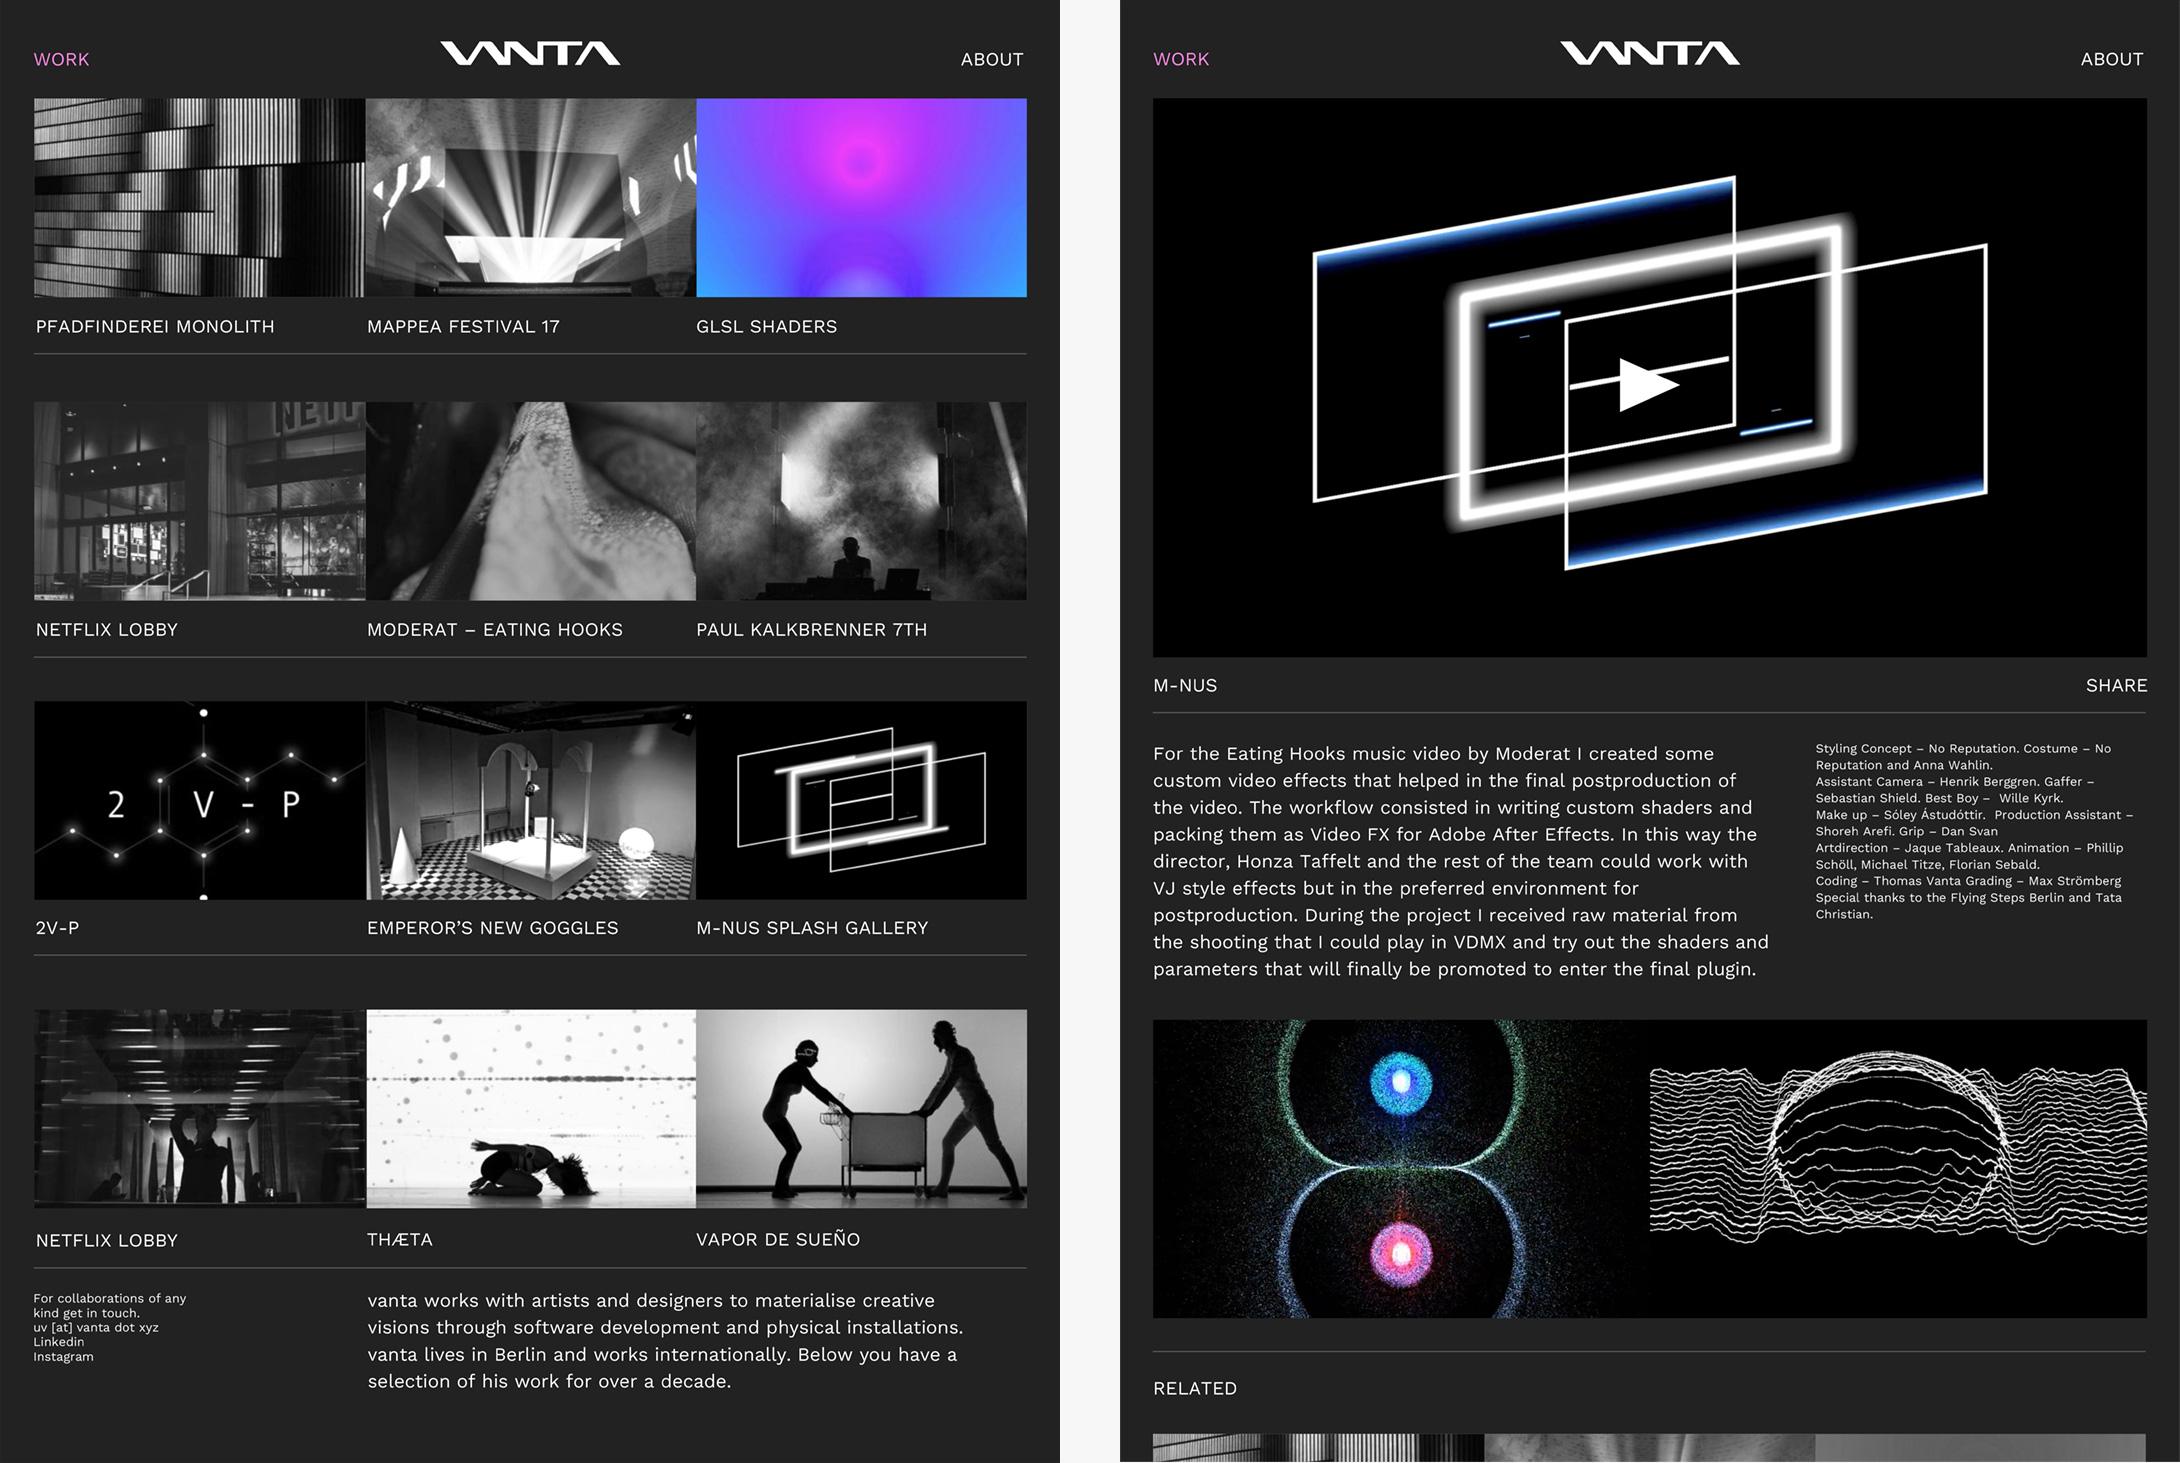 vanta-new-site.jpg